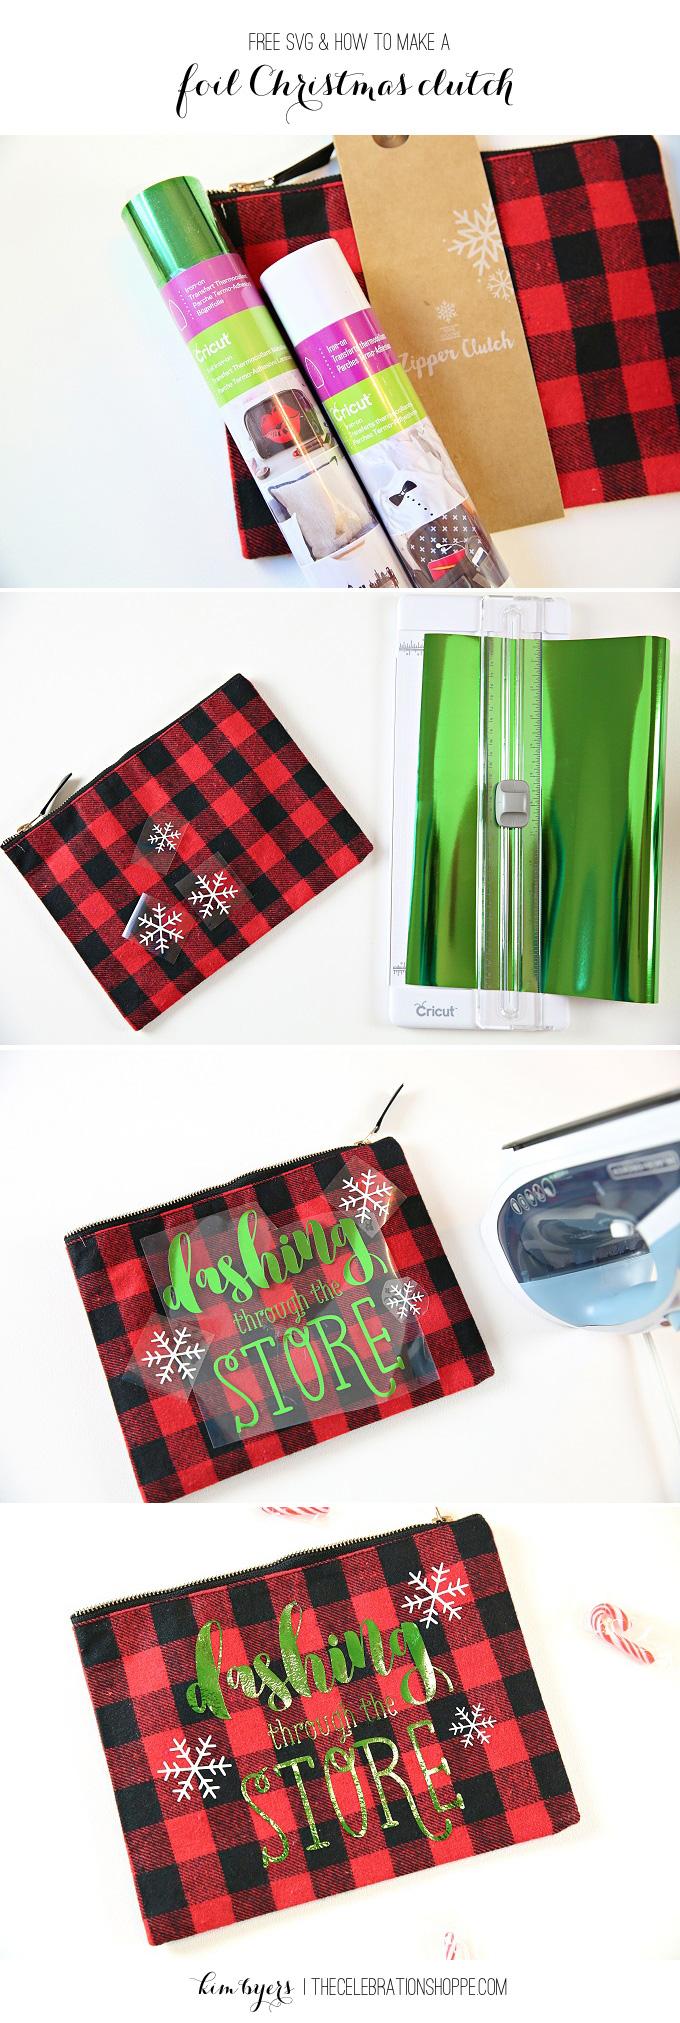 3-Dashing-Christmas-Clutch-Kim-Byers